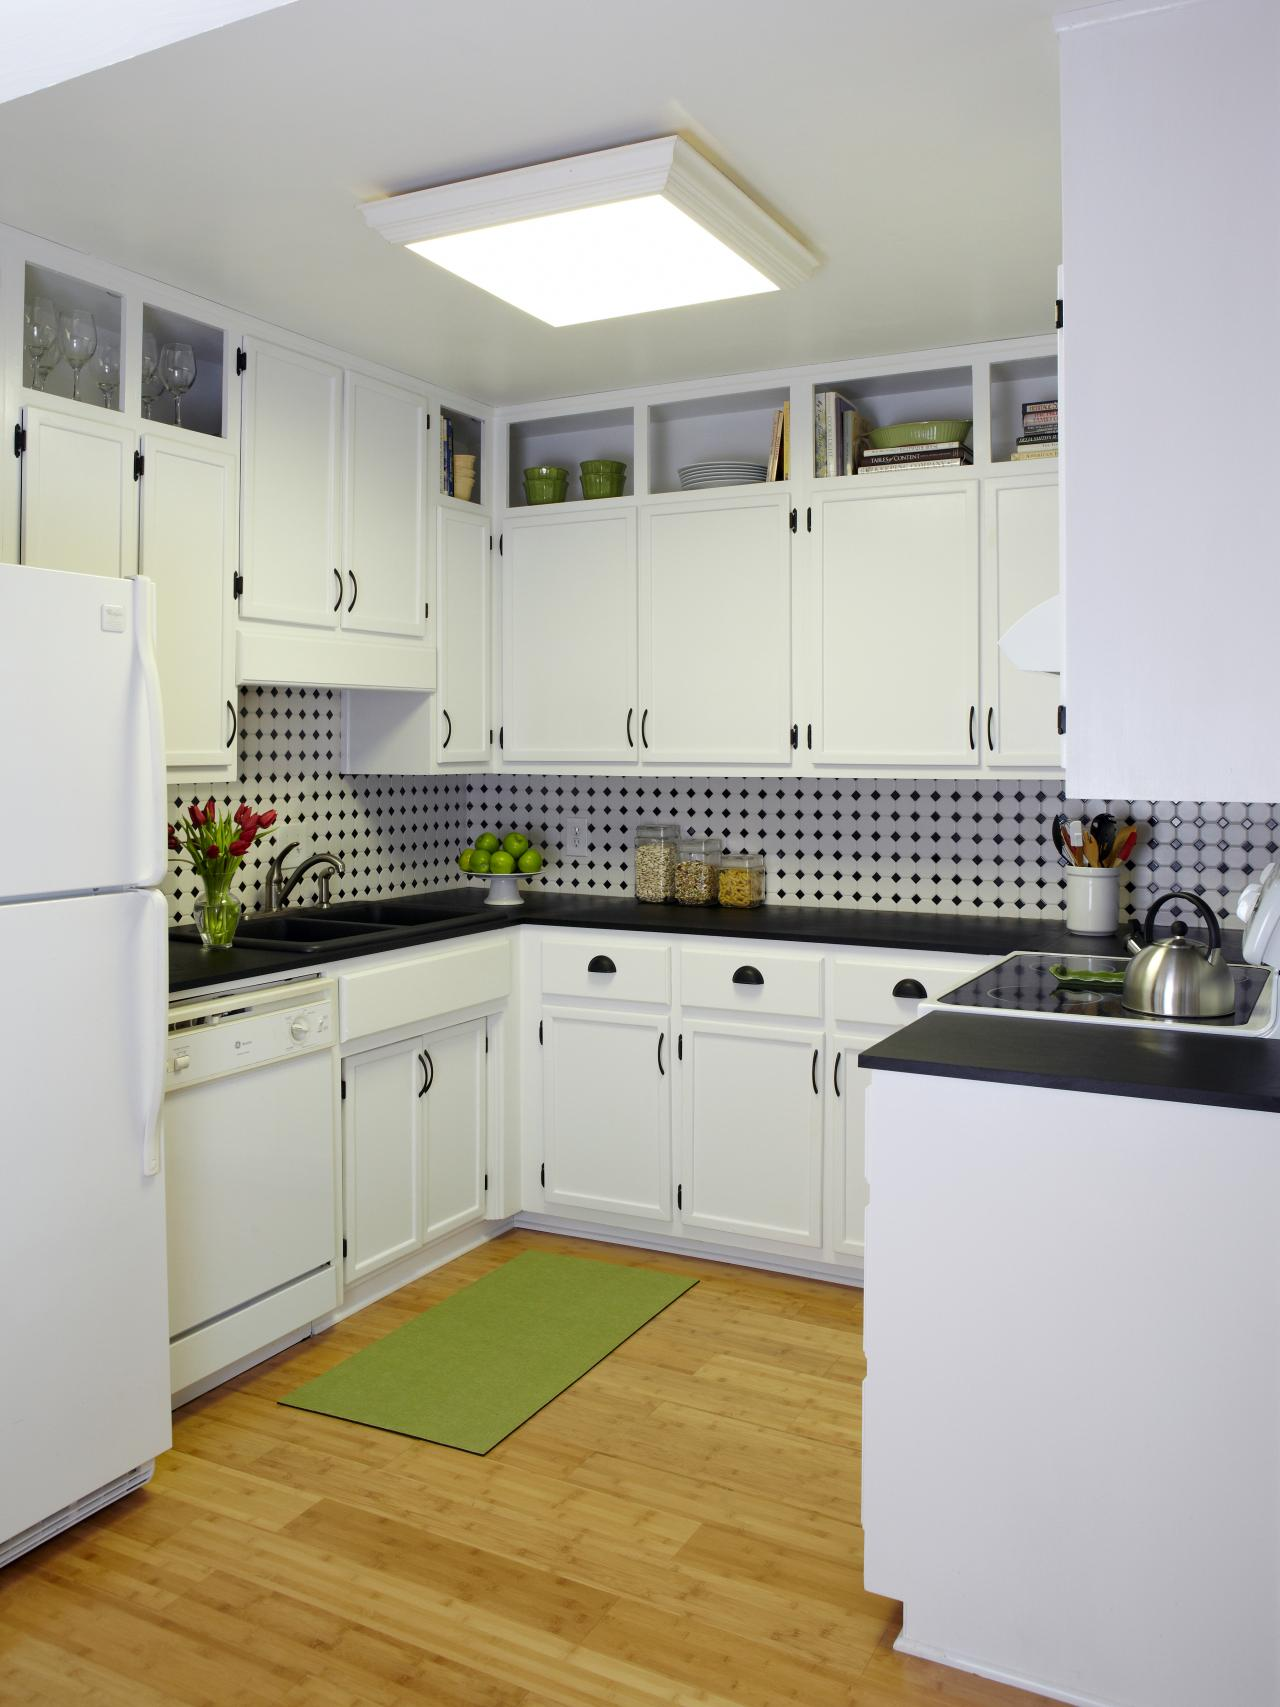 original_photog-jean-Allsopp-efter-hvid-kitchen_s3x4-jpg-rend-hgtvcom-1280-1707